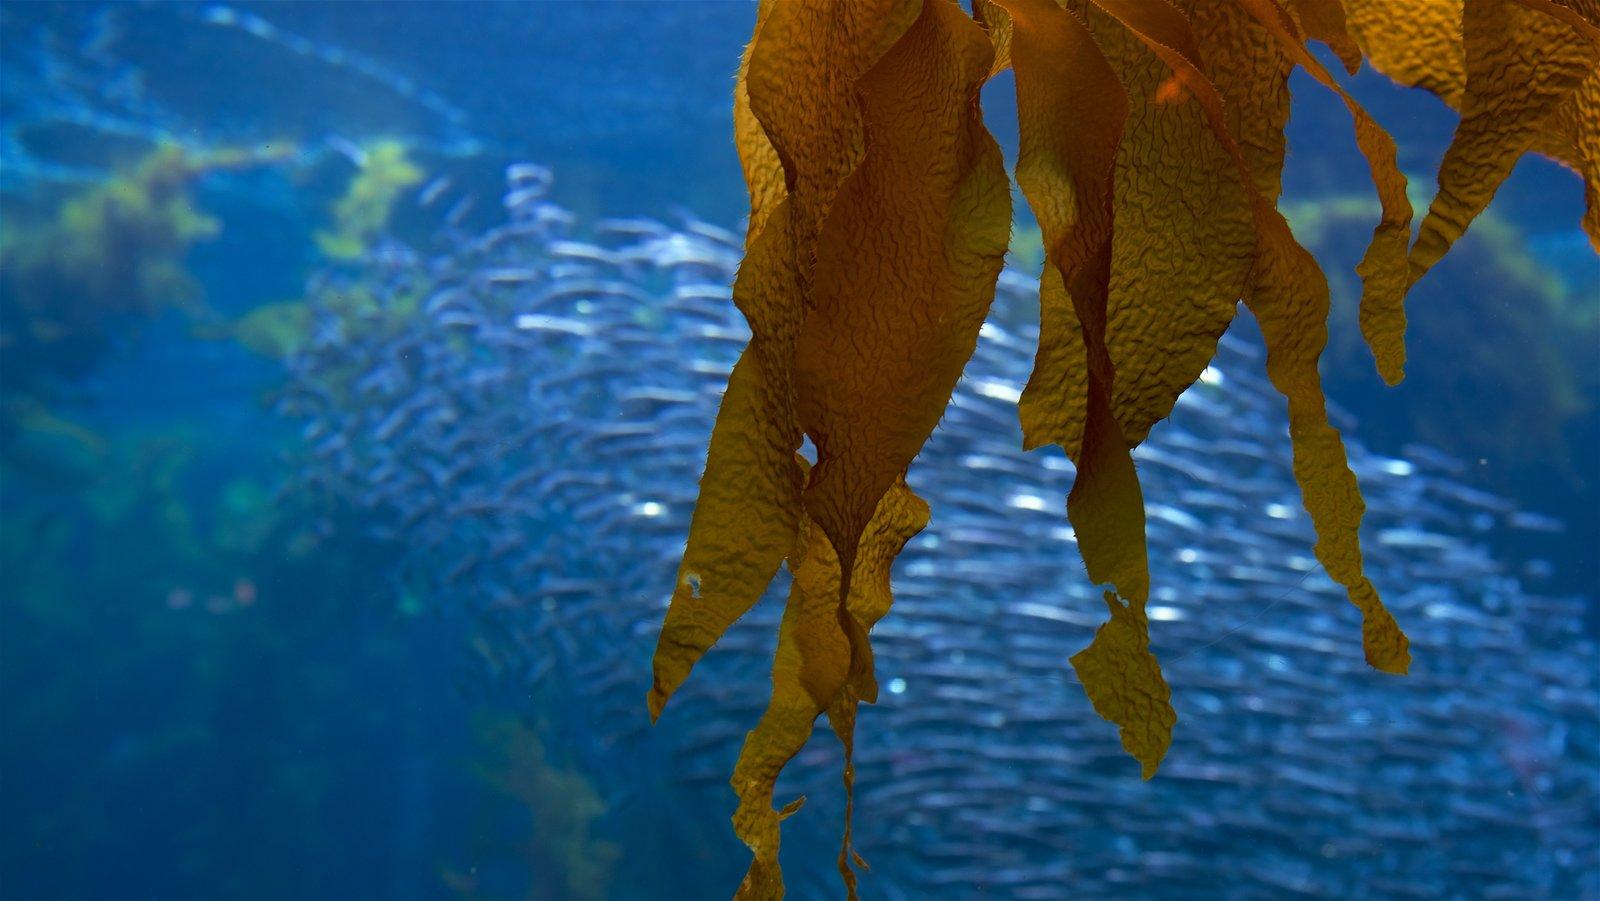 Monterey Bay Aquarium which includes marine life